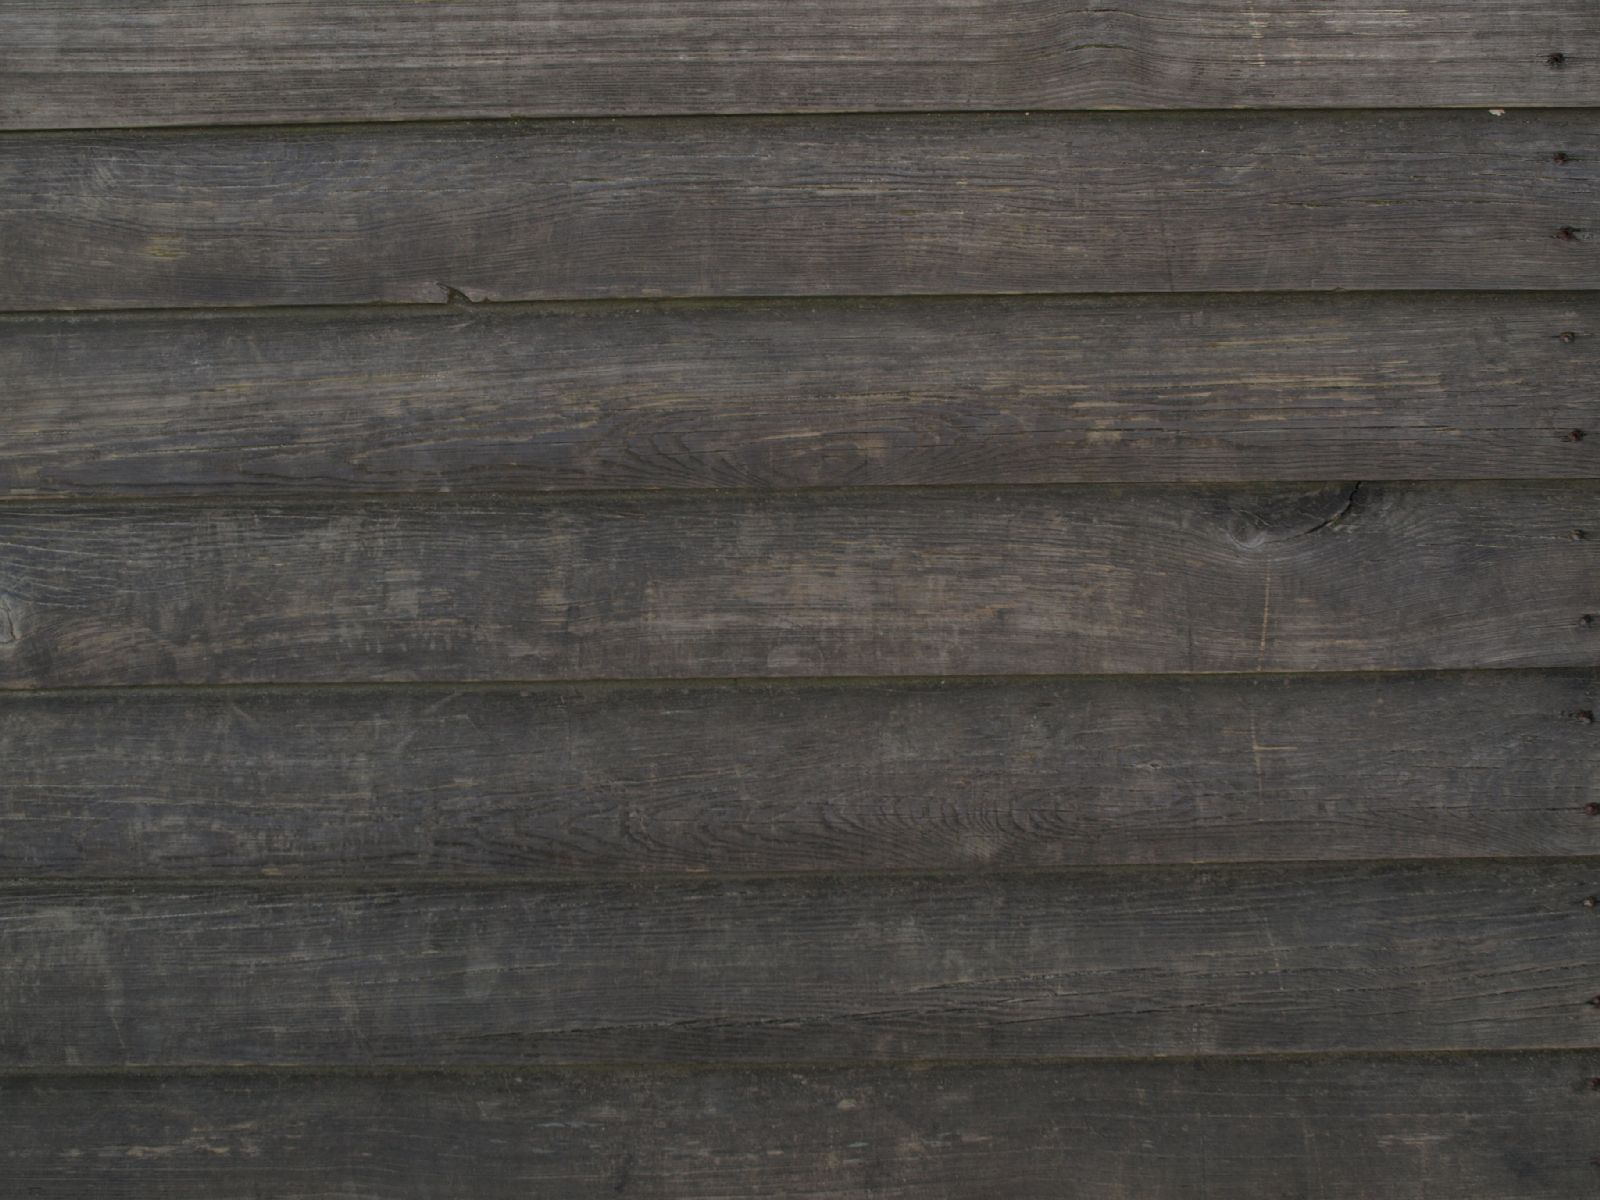 Wood_Texture_A_P4201604